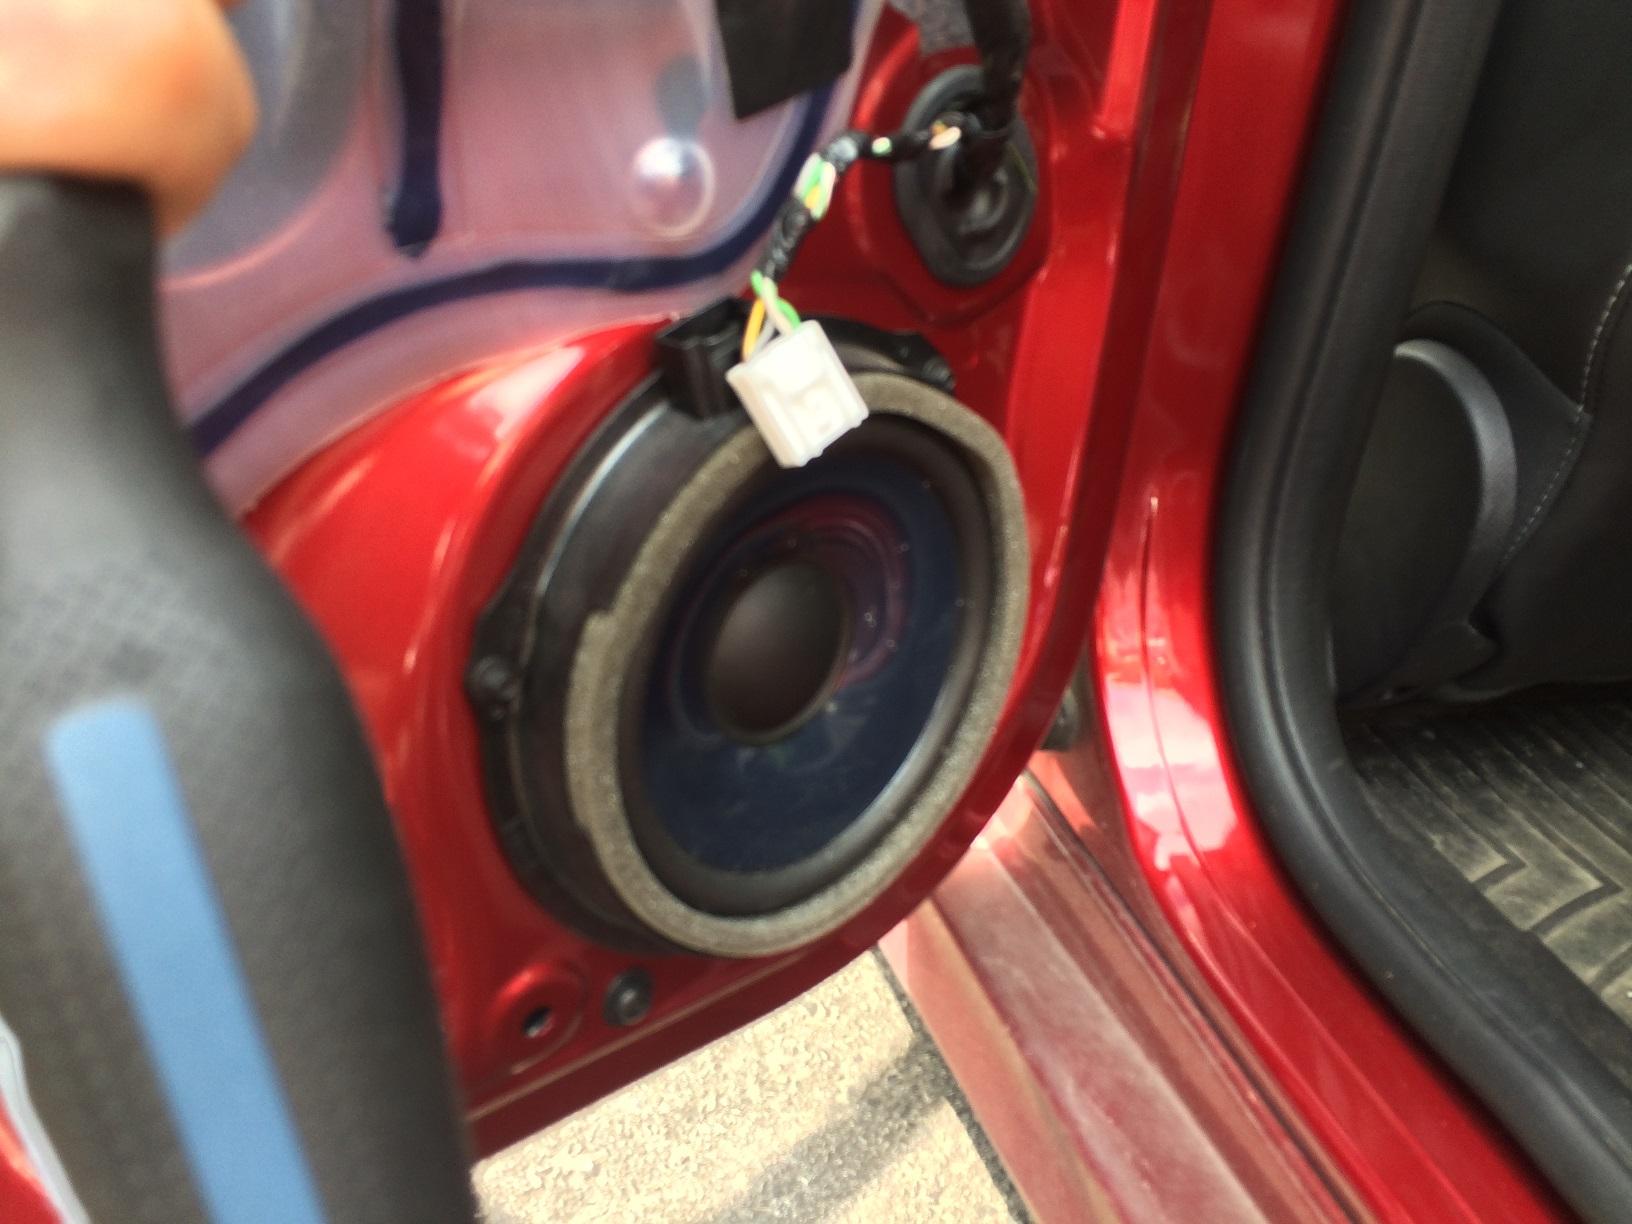 Diy speaker upgrade 2 jpg